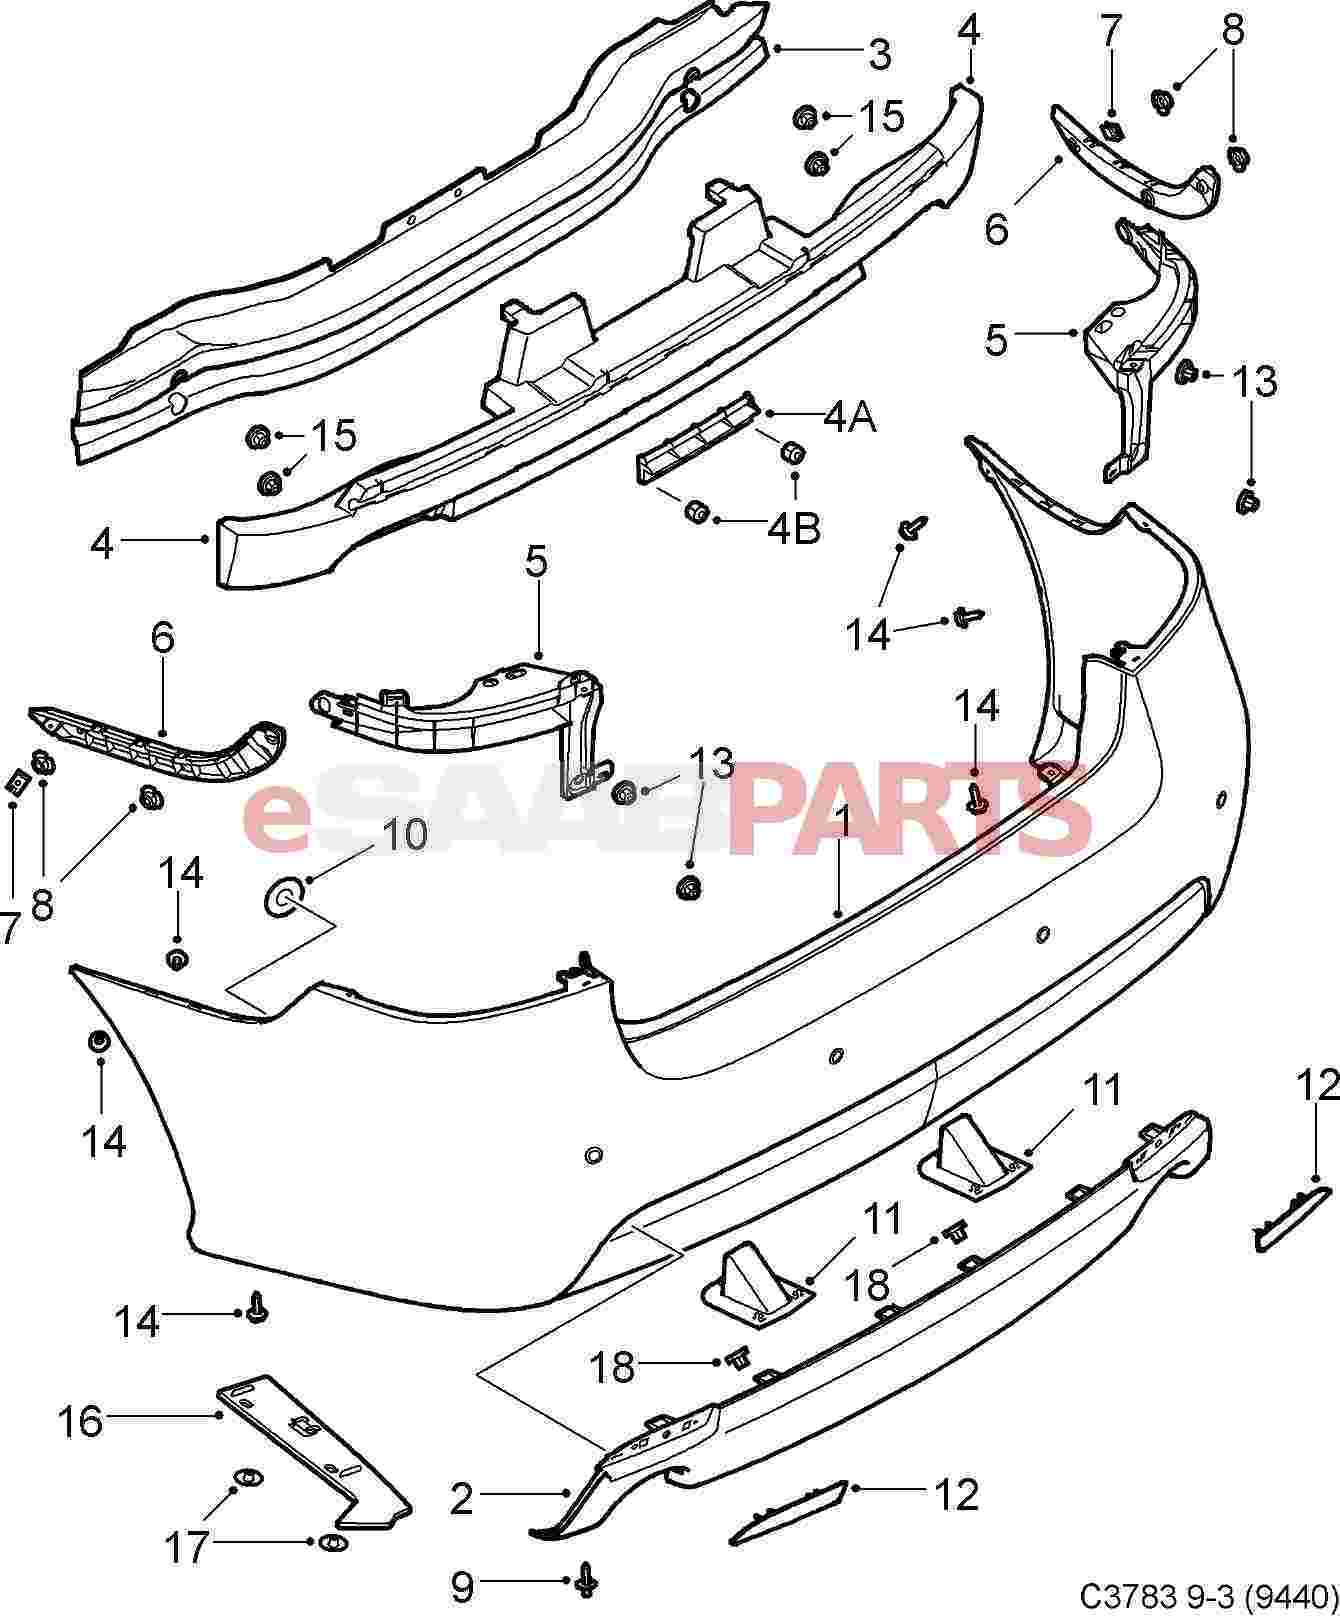 engine diagram 99 saab 9 3 turbo  u2022 wiring diagram for free